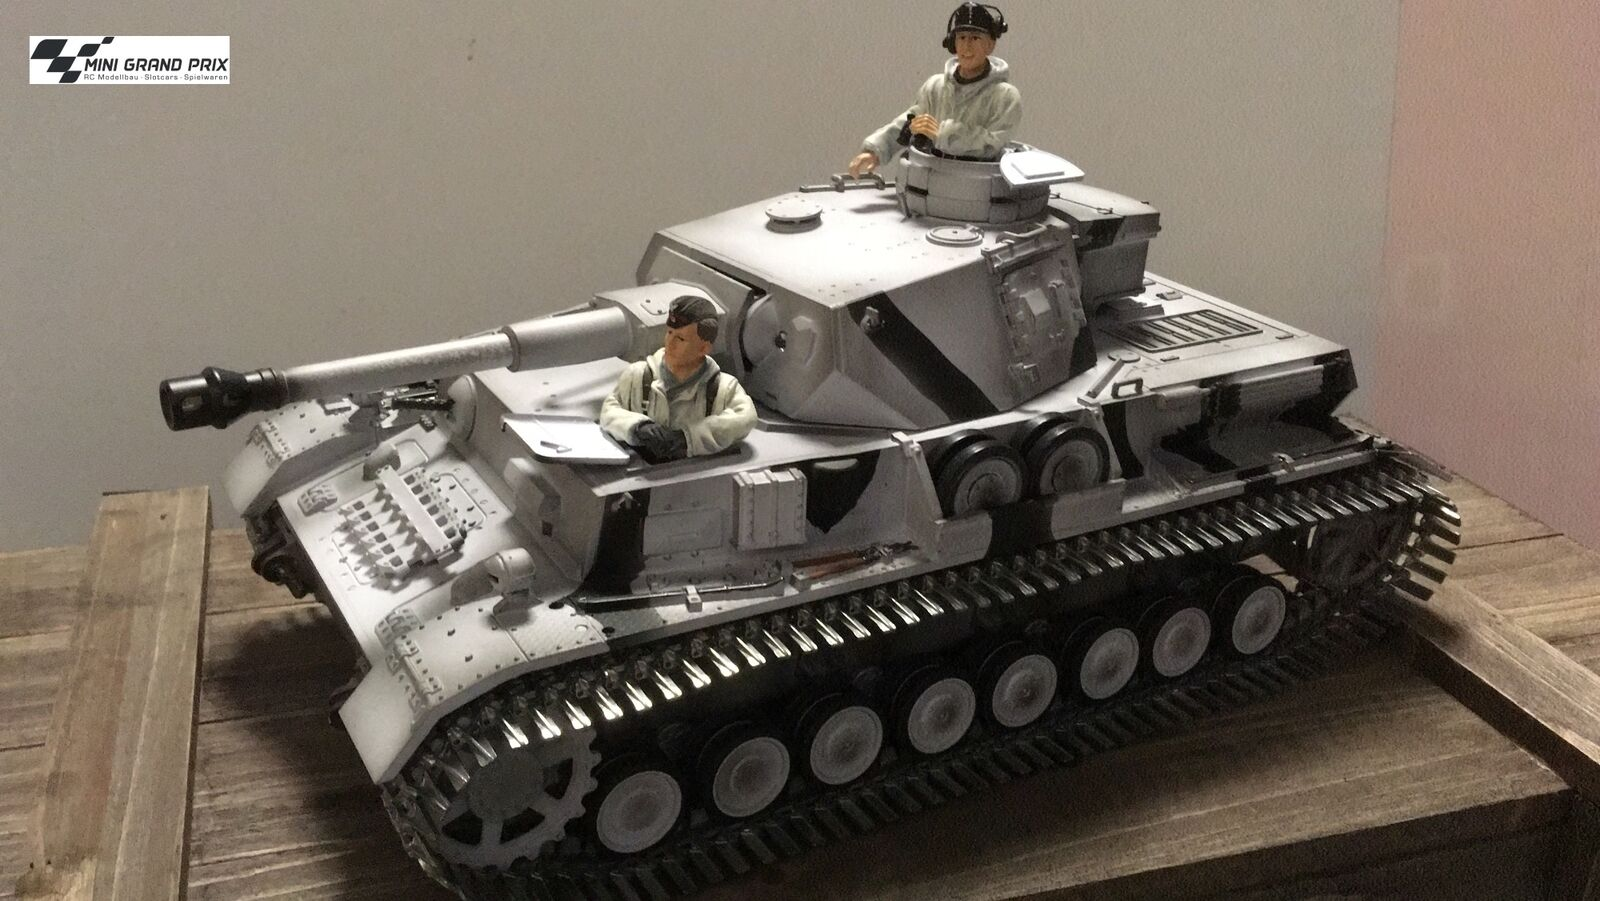 TORRO 1 16 RC Tank 4 Version G wintertarn ir-battle 1110385906 +2 Figures